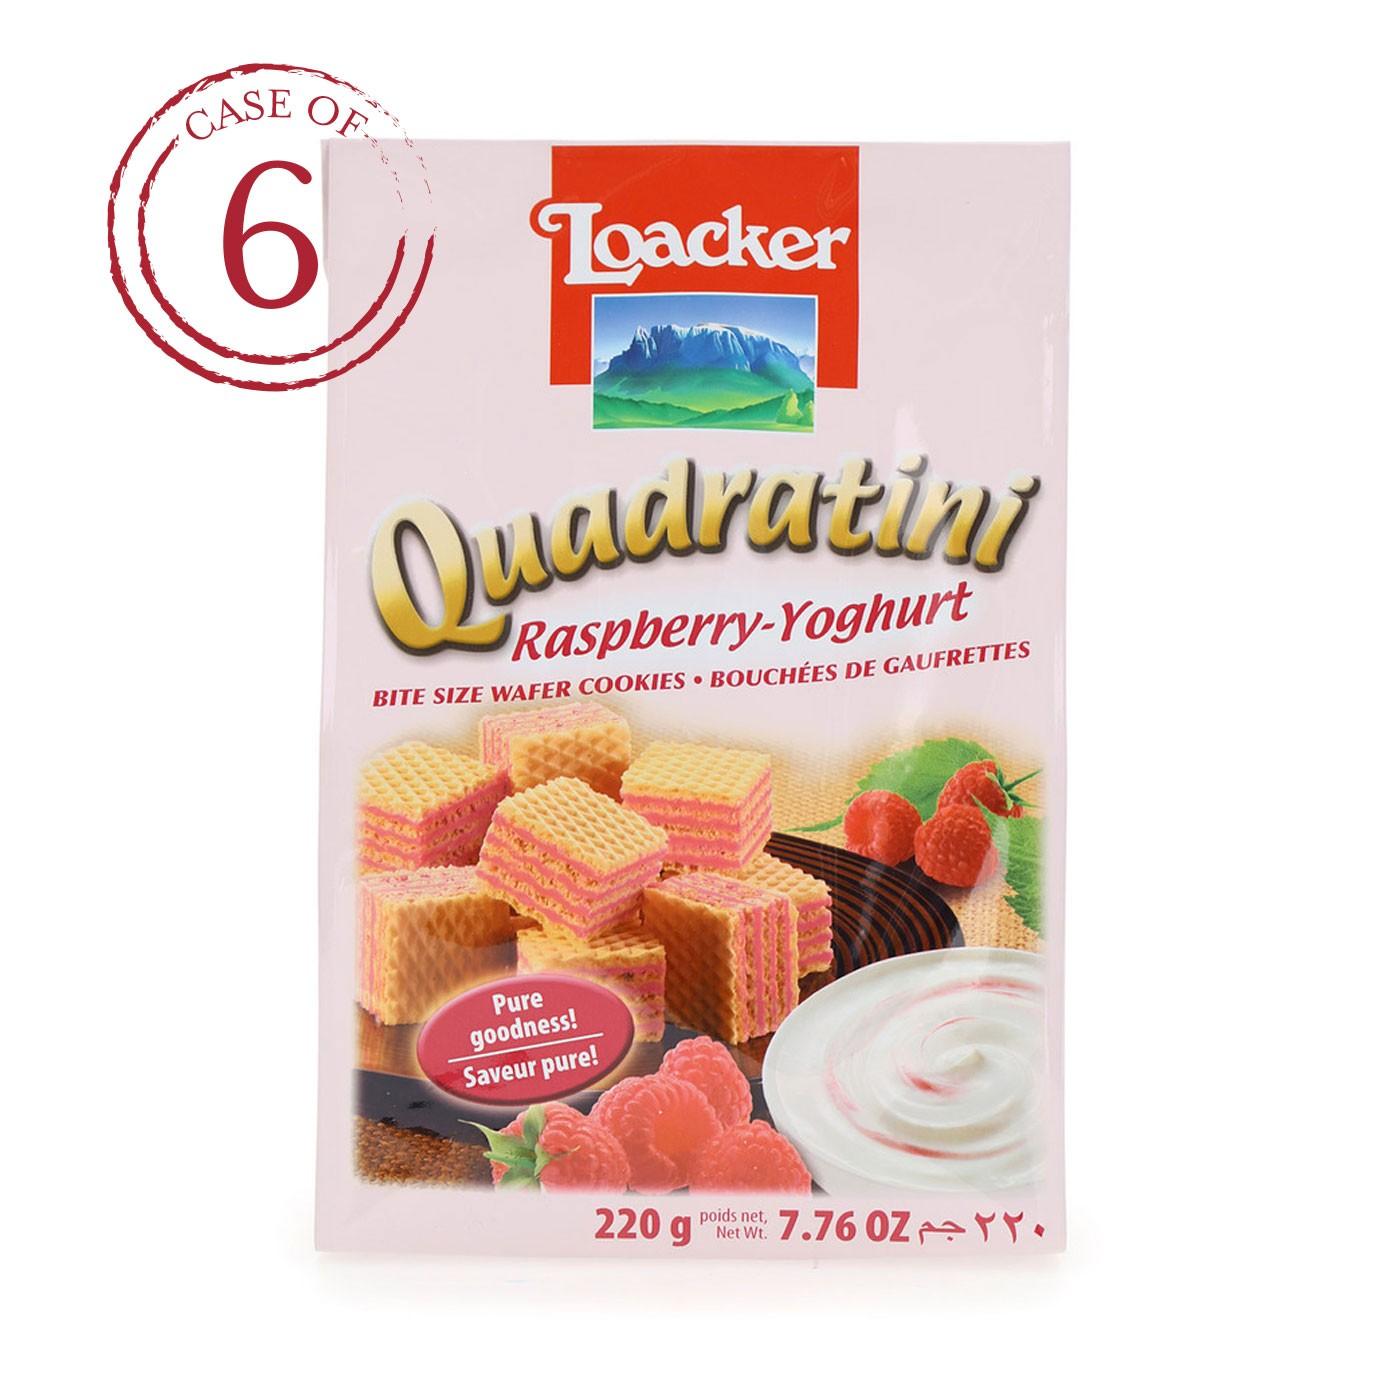 Raspberry-Yogurt Quadratini 7.7 oz - Case of 6